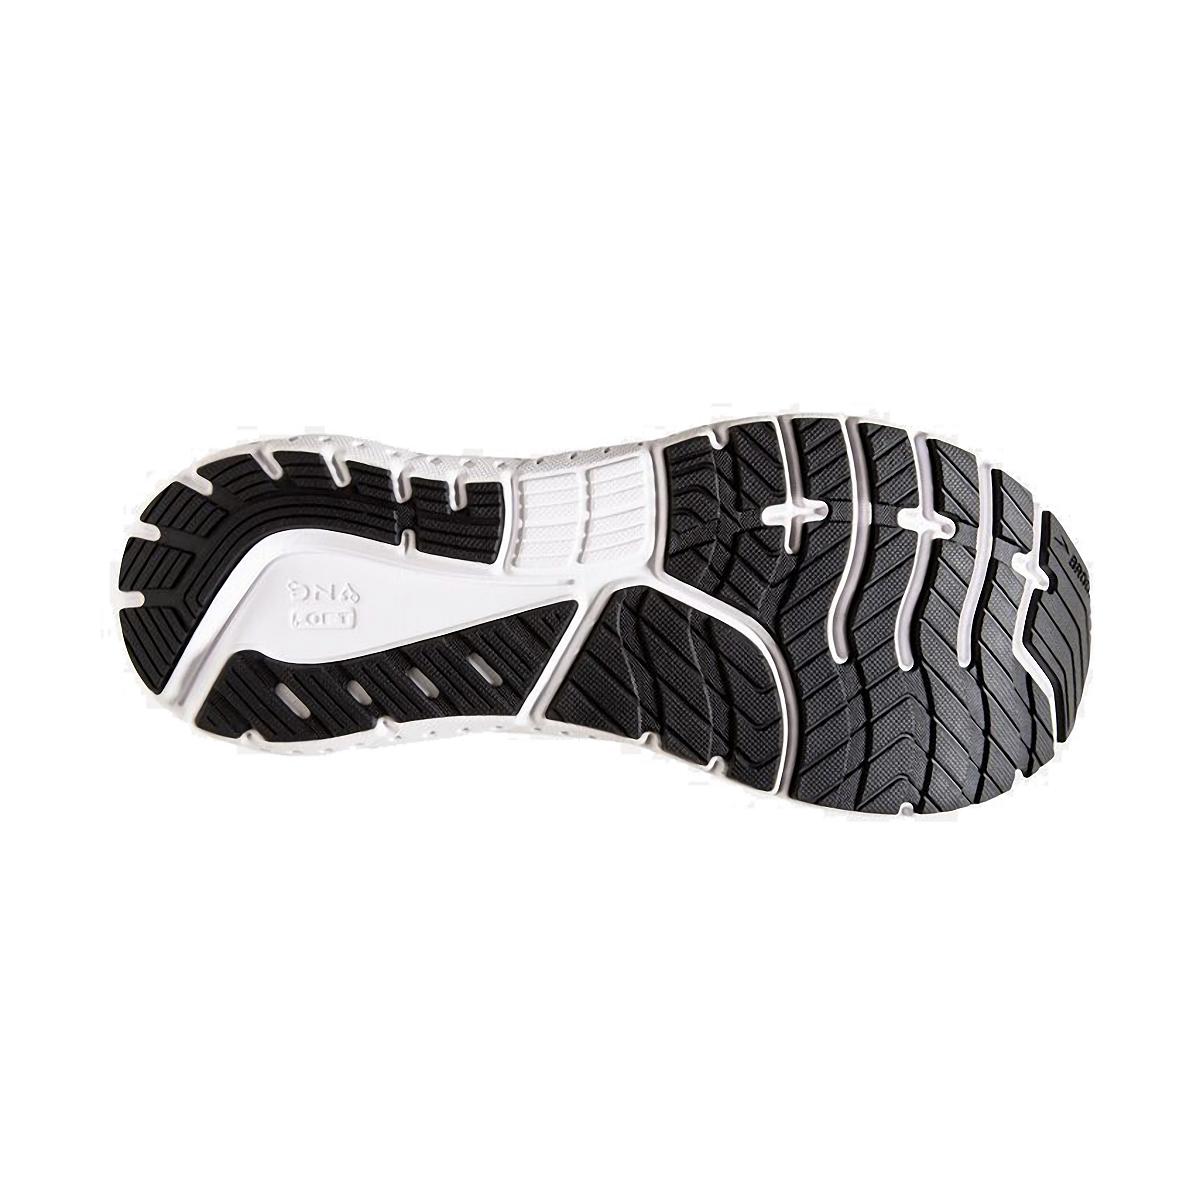 Men's Brooks Glycerin 18 Running Shoe - Color: White/Black/Red - Size: 7 - Width: Regular, White/Black/Red, large, image 3